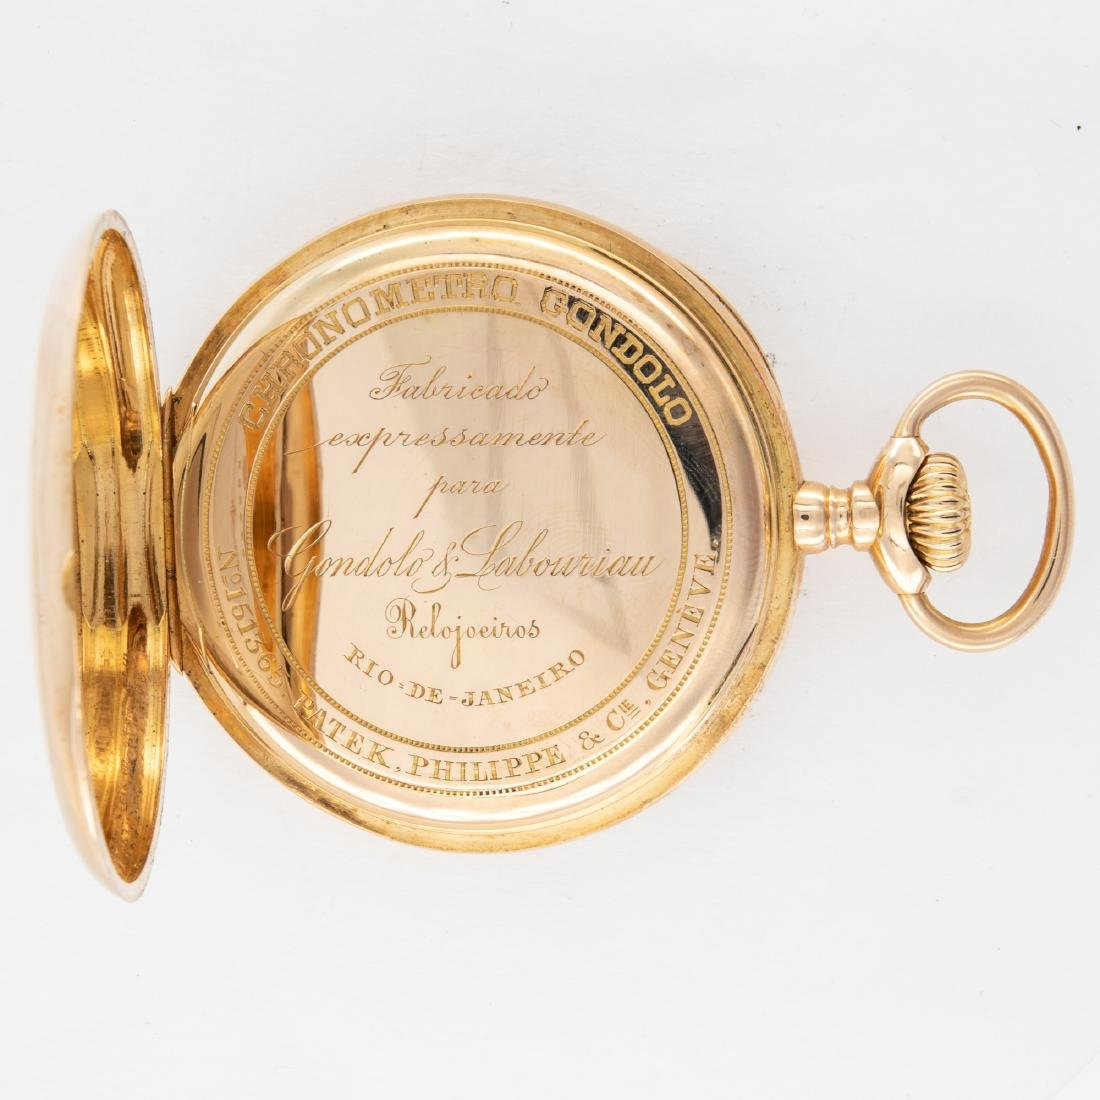 GOLD PATEK PHILIPPE POCKET WATCH, CIRCA1905 - 2